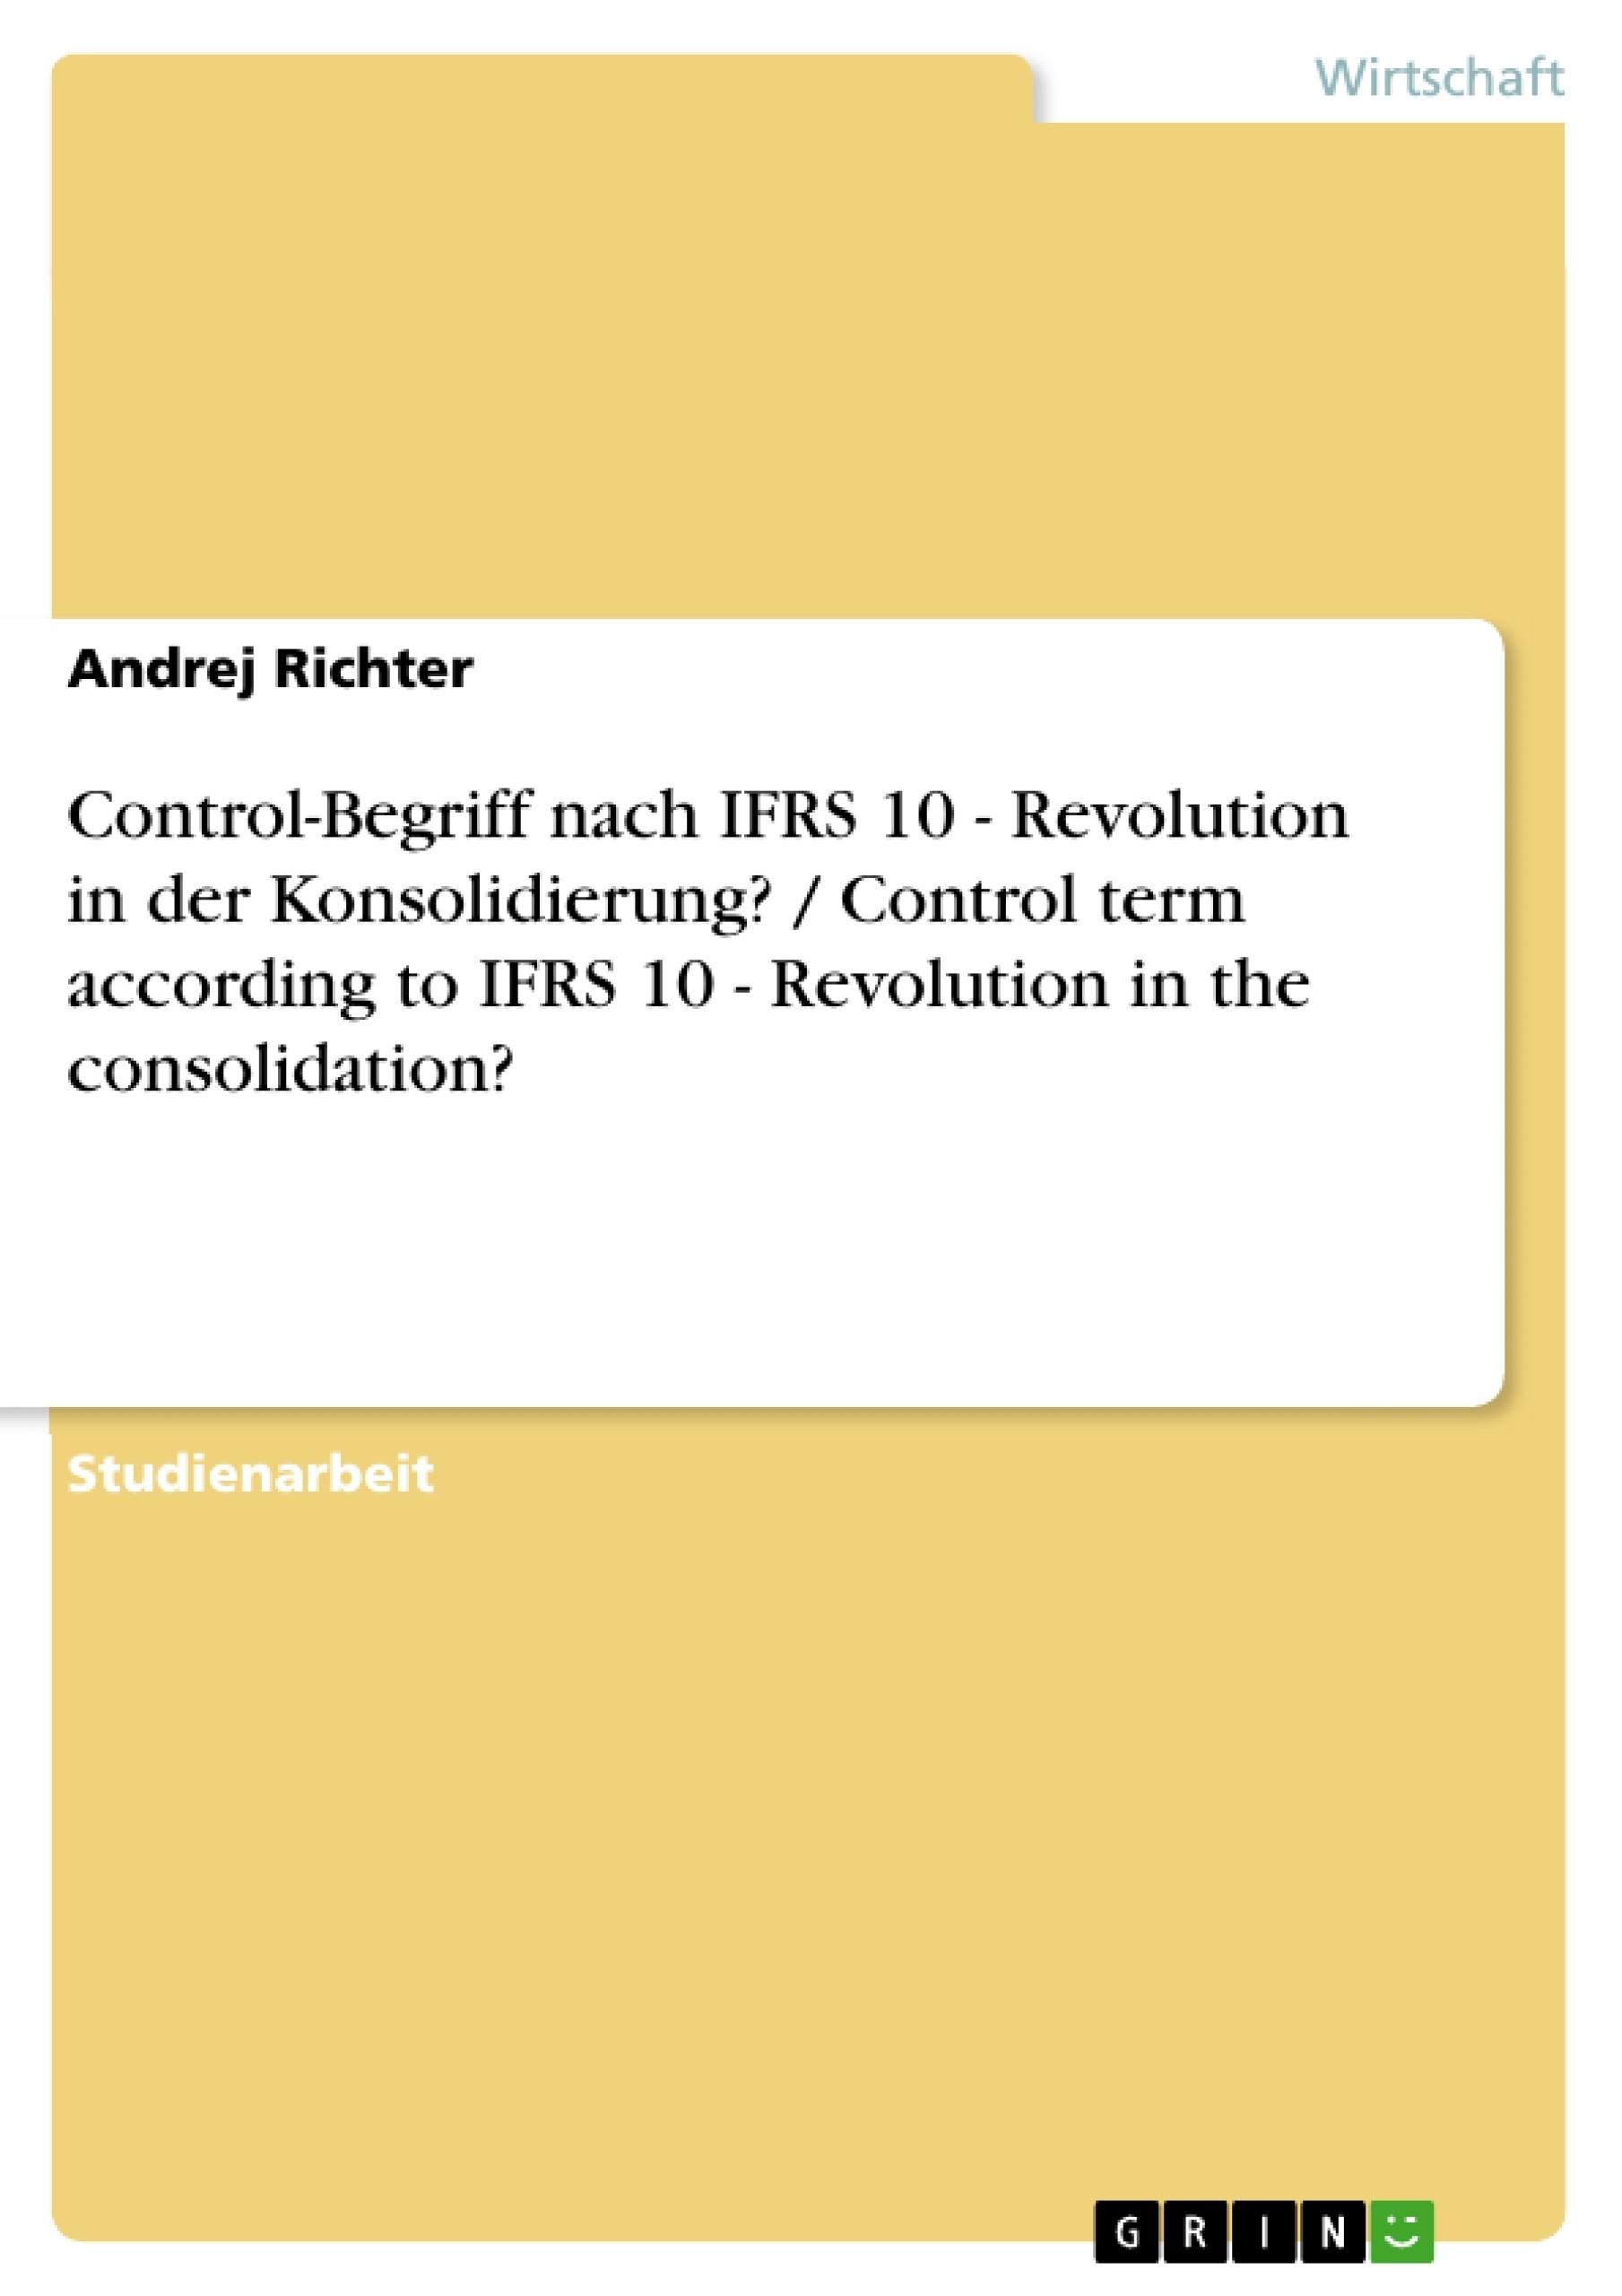 Titel: Control-Begriff nach IFRS 10 - Revolution in der Konsolidierung? / Control term according to IFRS 10 - Revolution in the consolidation?